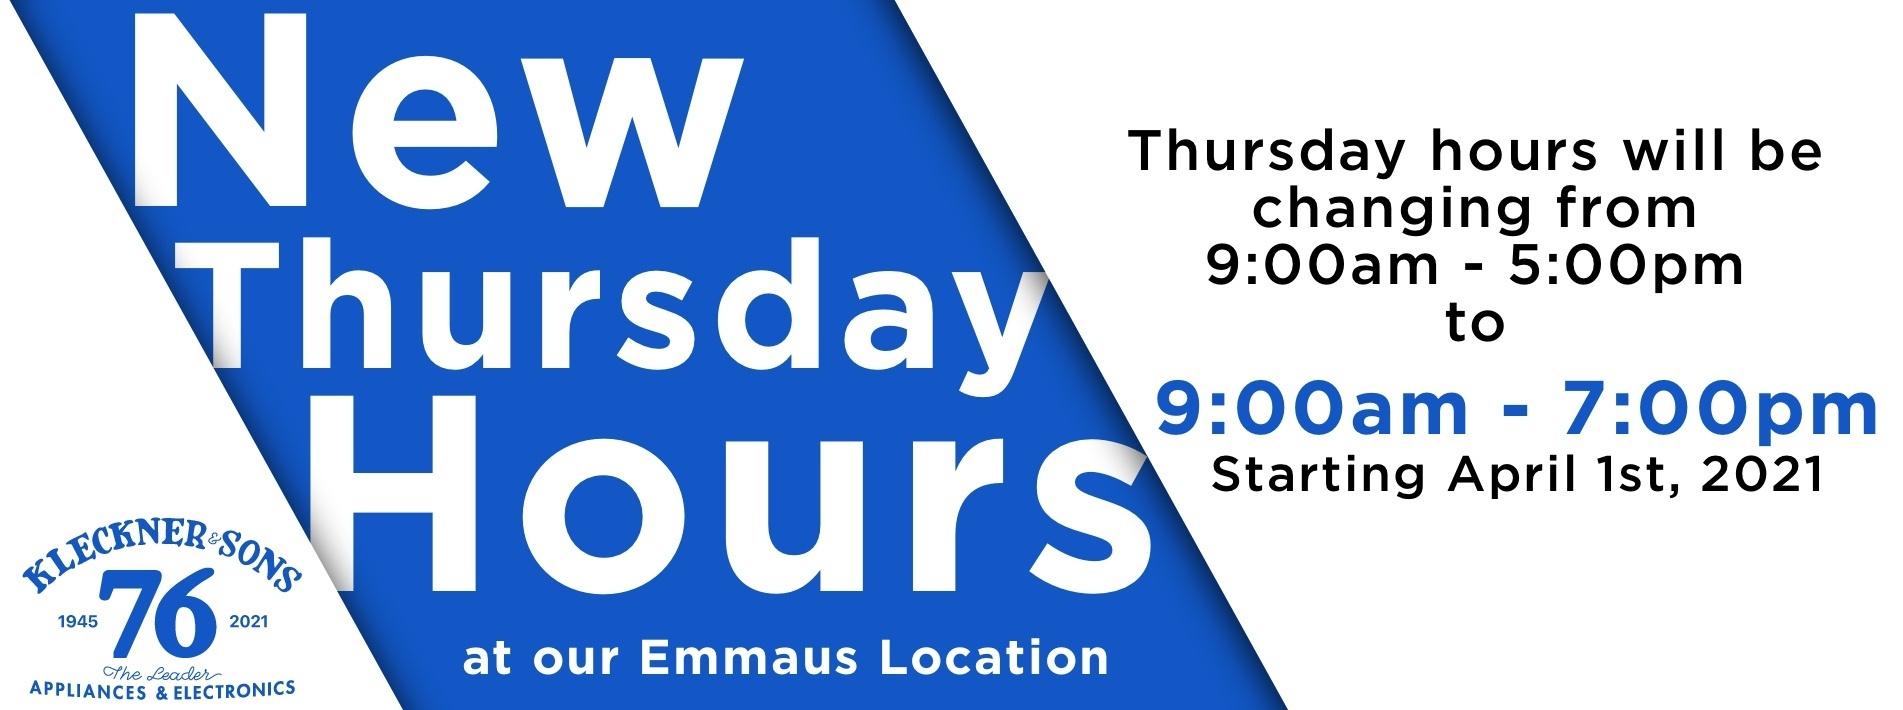 New Hours: Emmaus Location